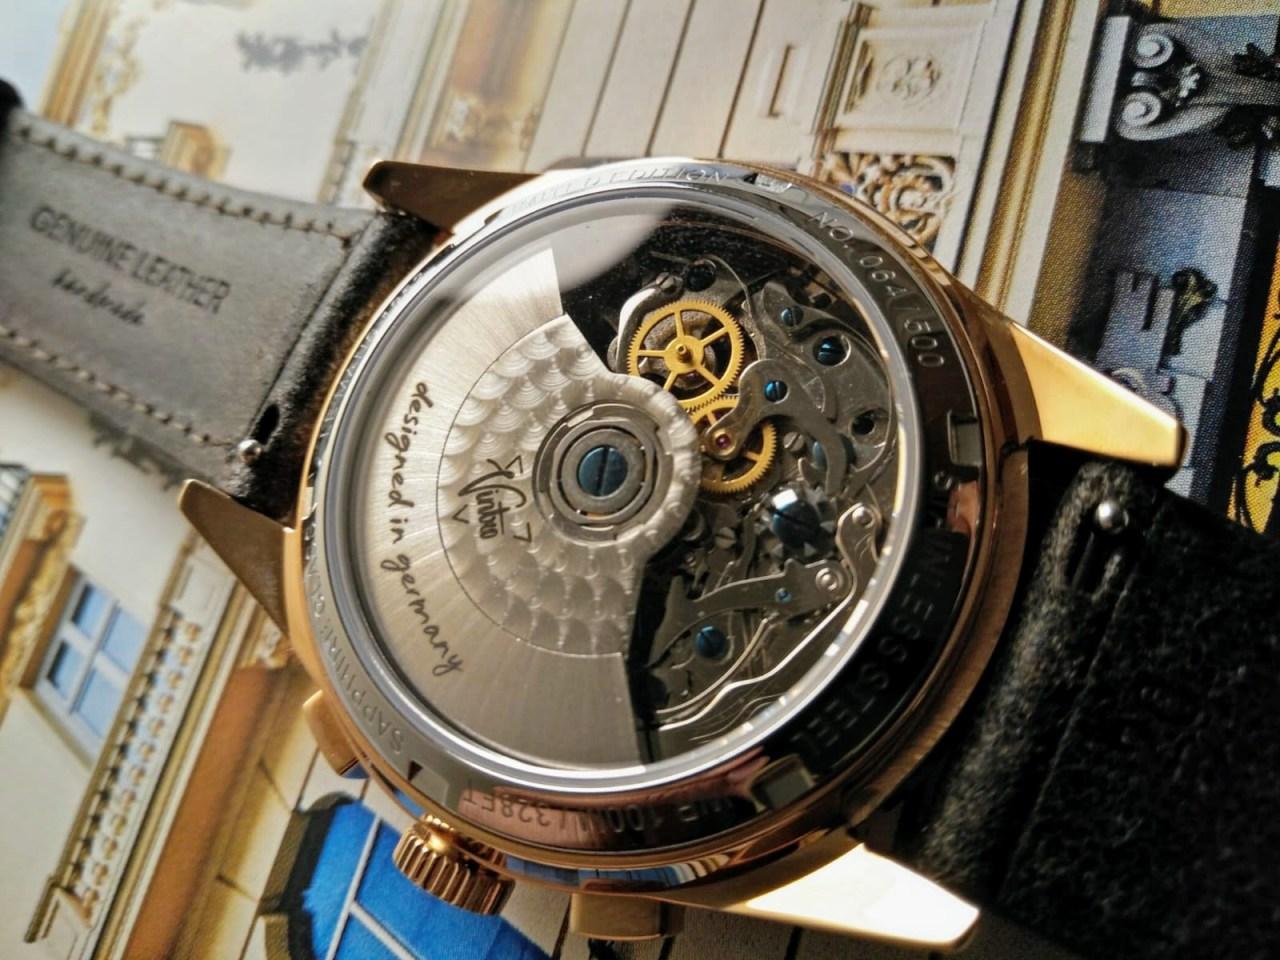 Seagull movement Le Mans 1952 Chronograph